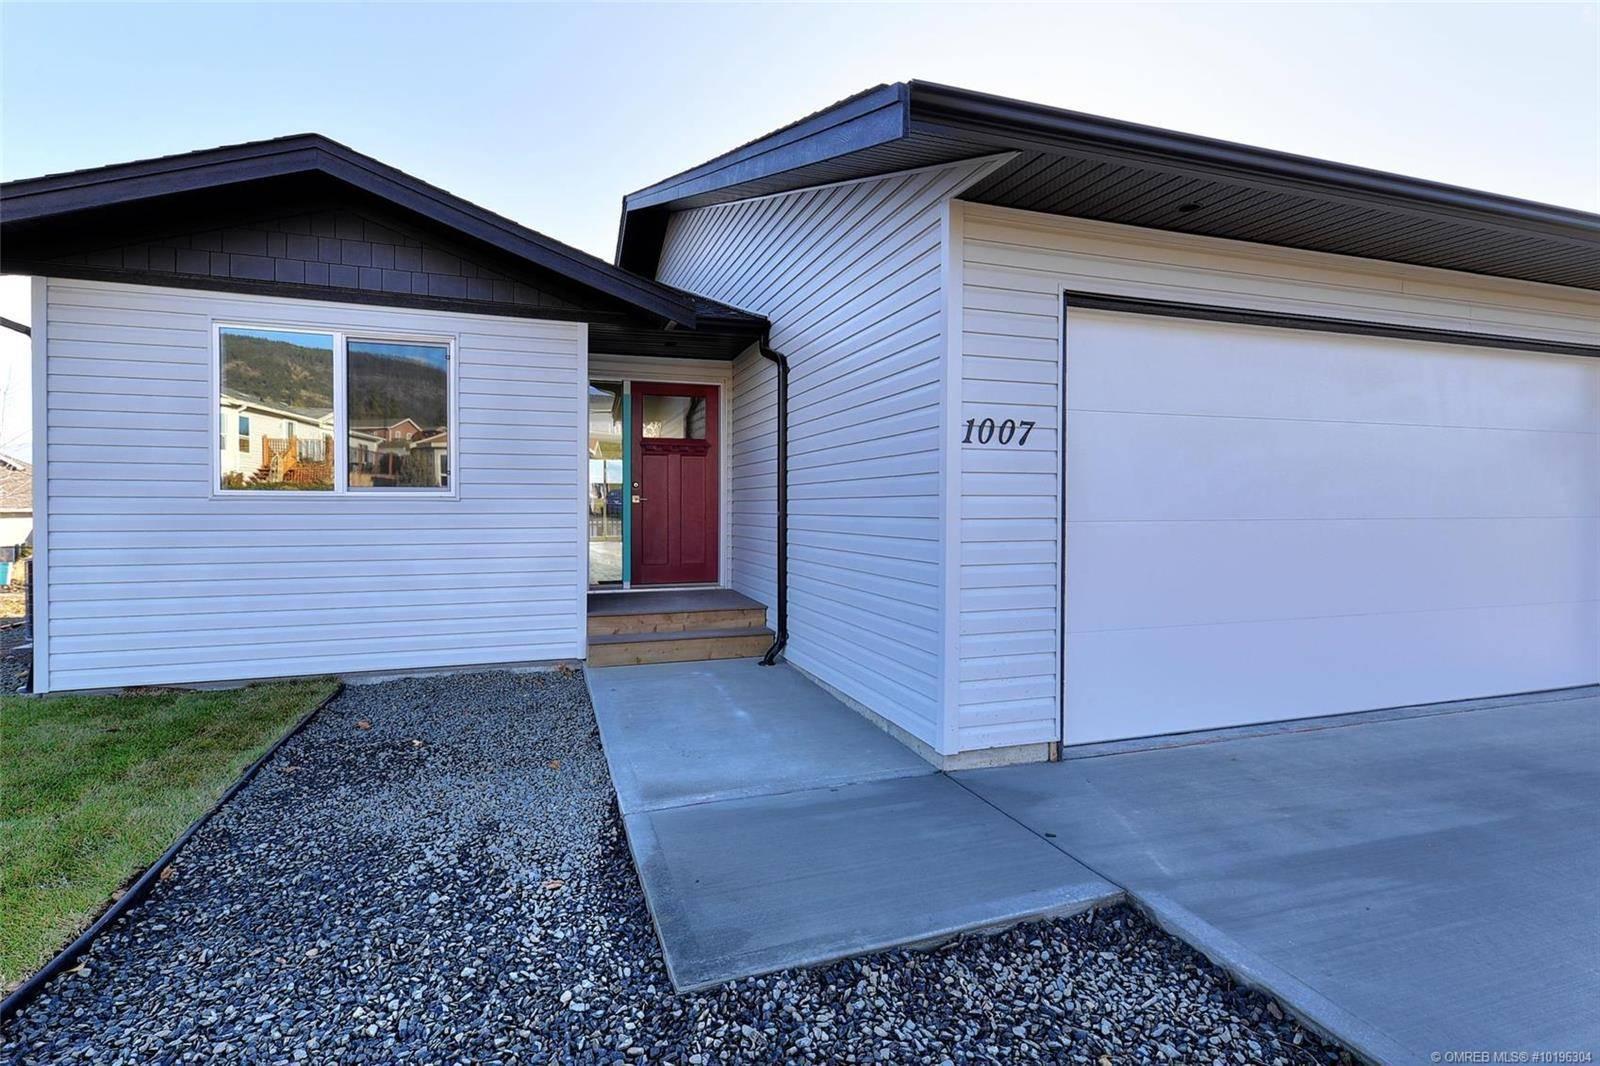 Townhouse for sale at 2440 Old Okanagan Hy Unit 1007 West Kelowna British Columbia - MLS: 10196304